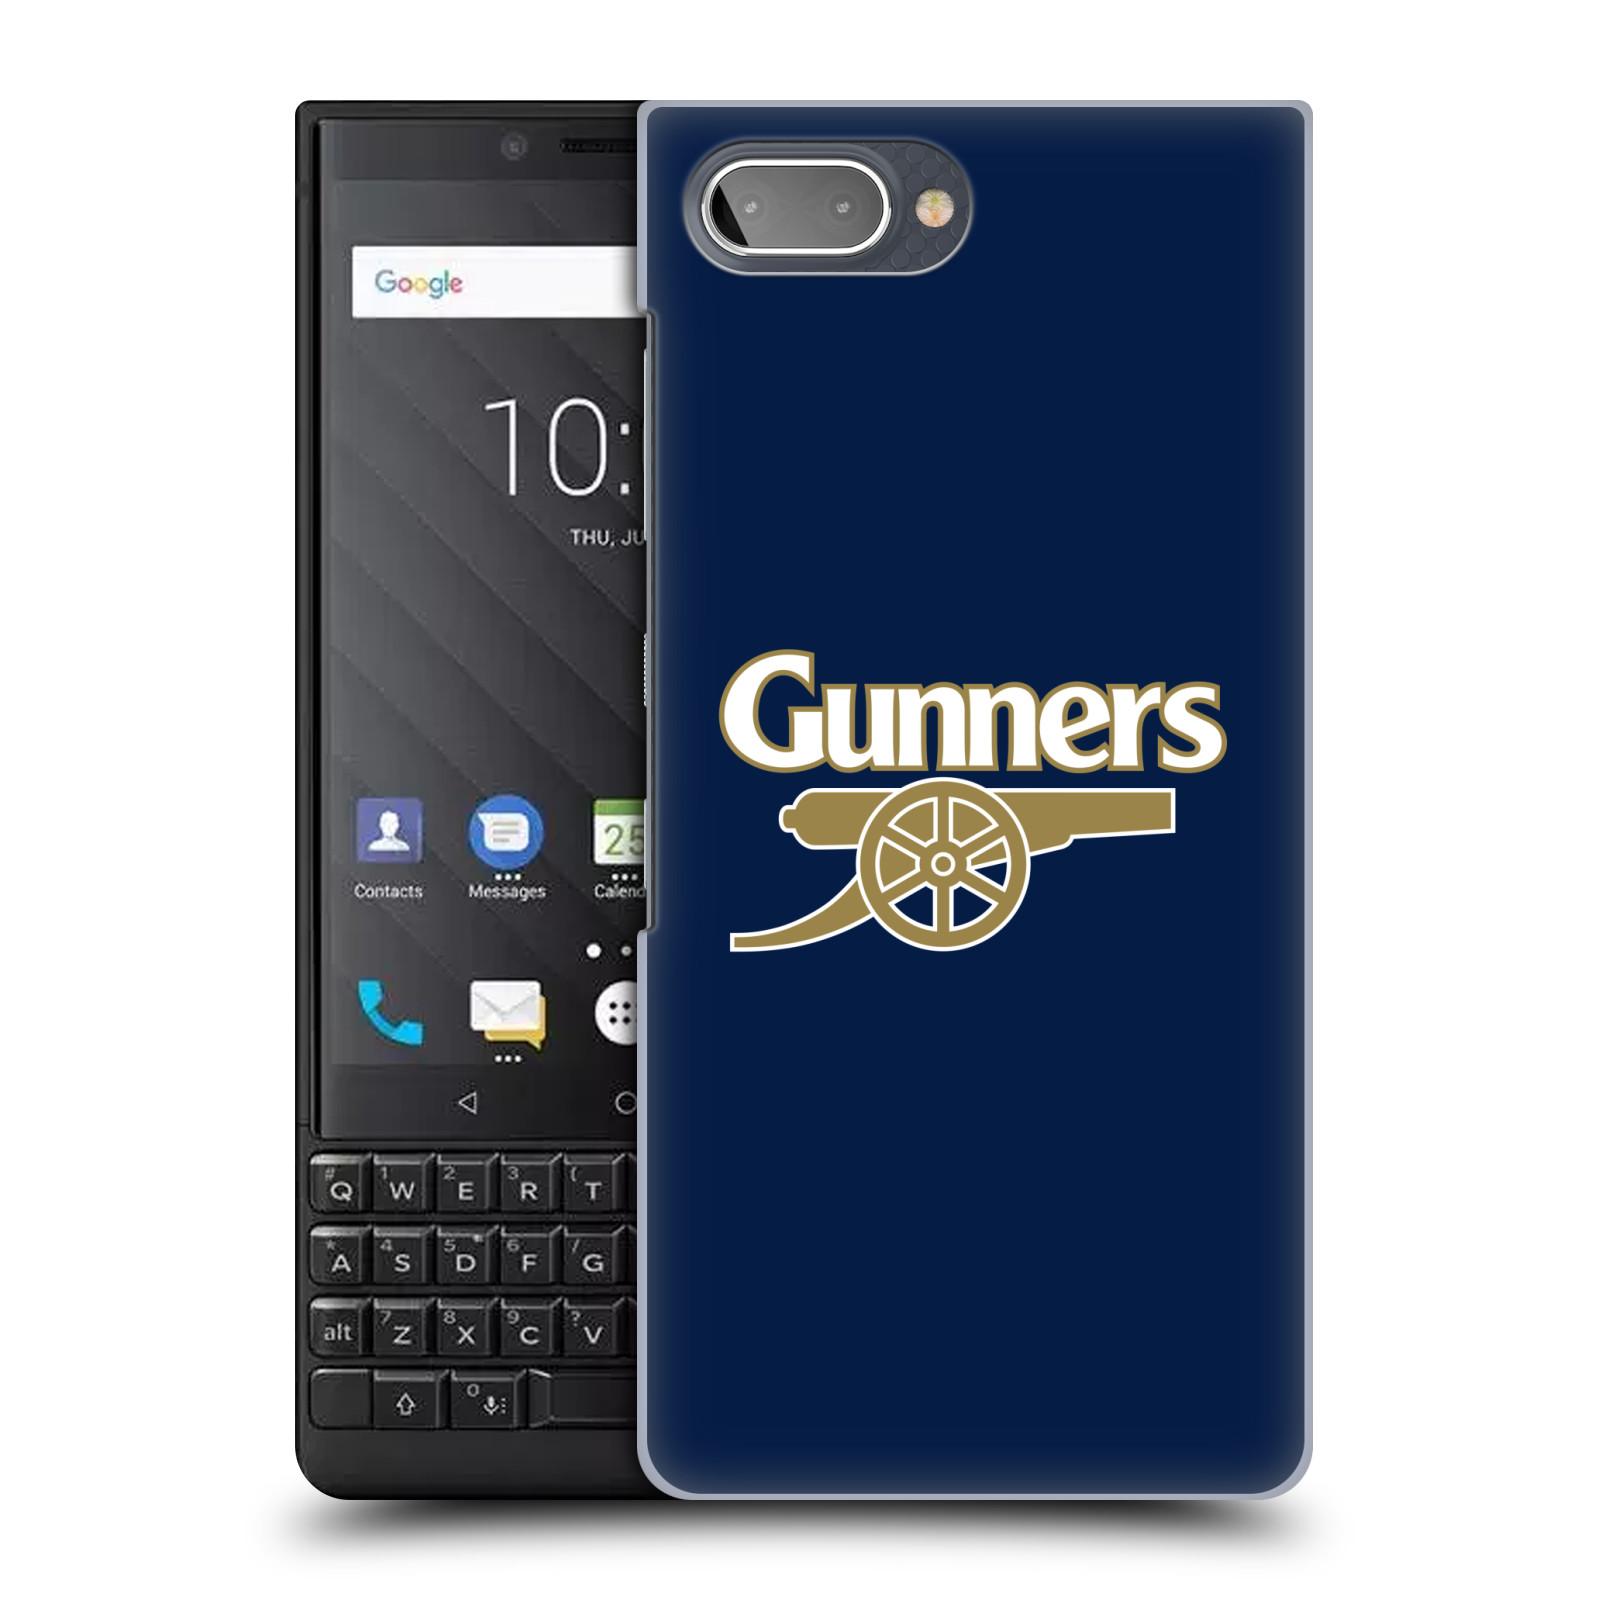 Plastové pouzdro na mobil Blackberry Key 2 - Head Case - Arsenal FC - Gunners